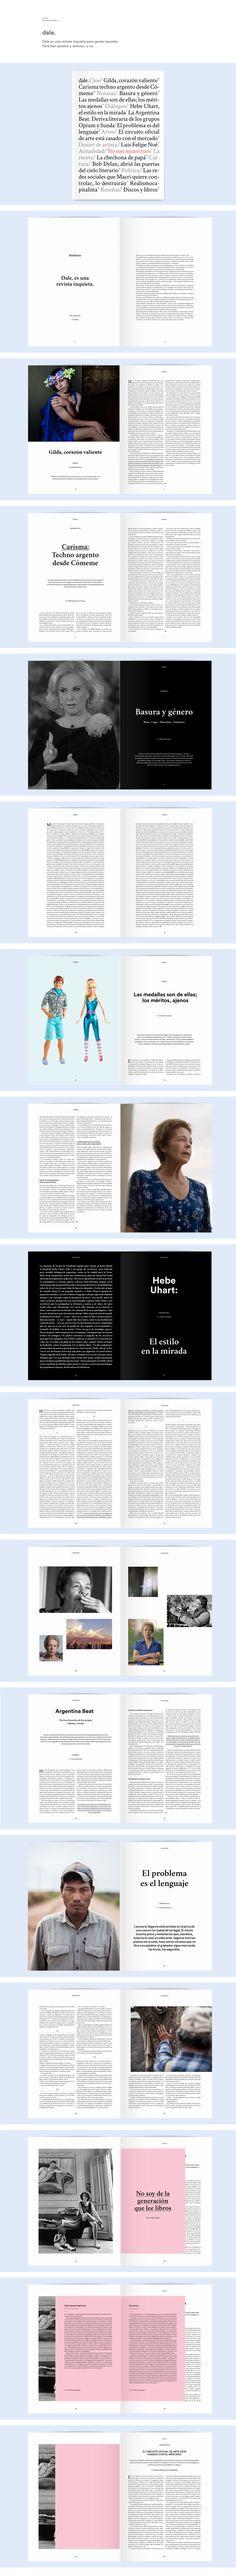 Revista Dale. on Behance